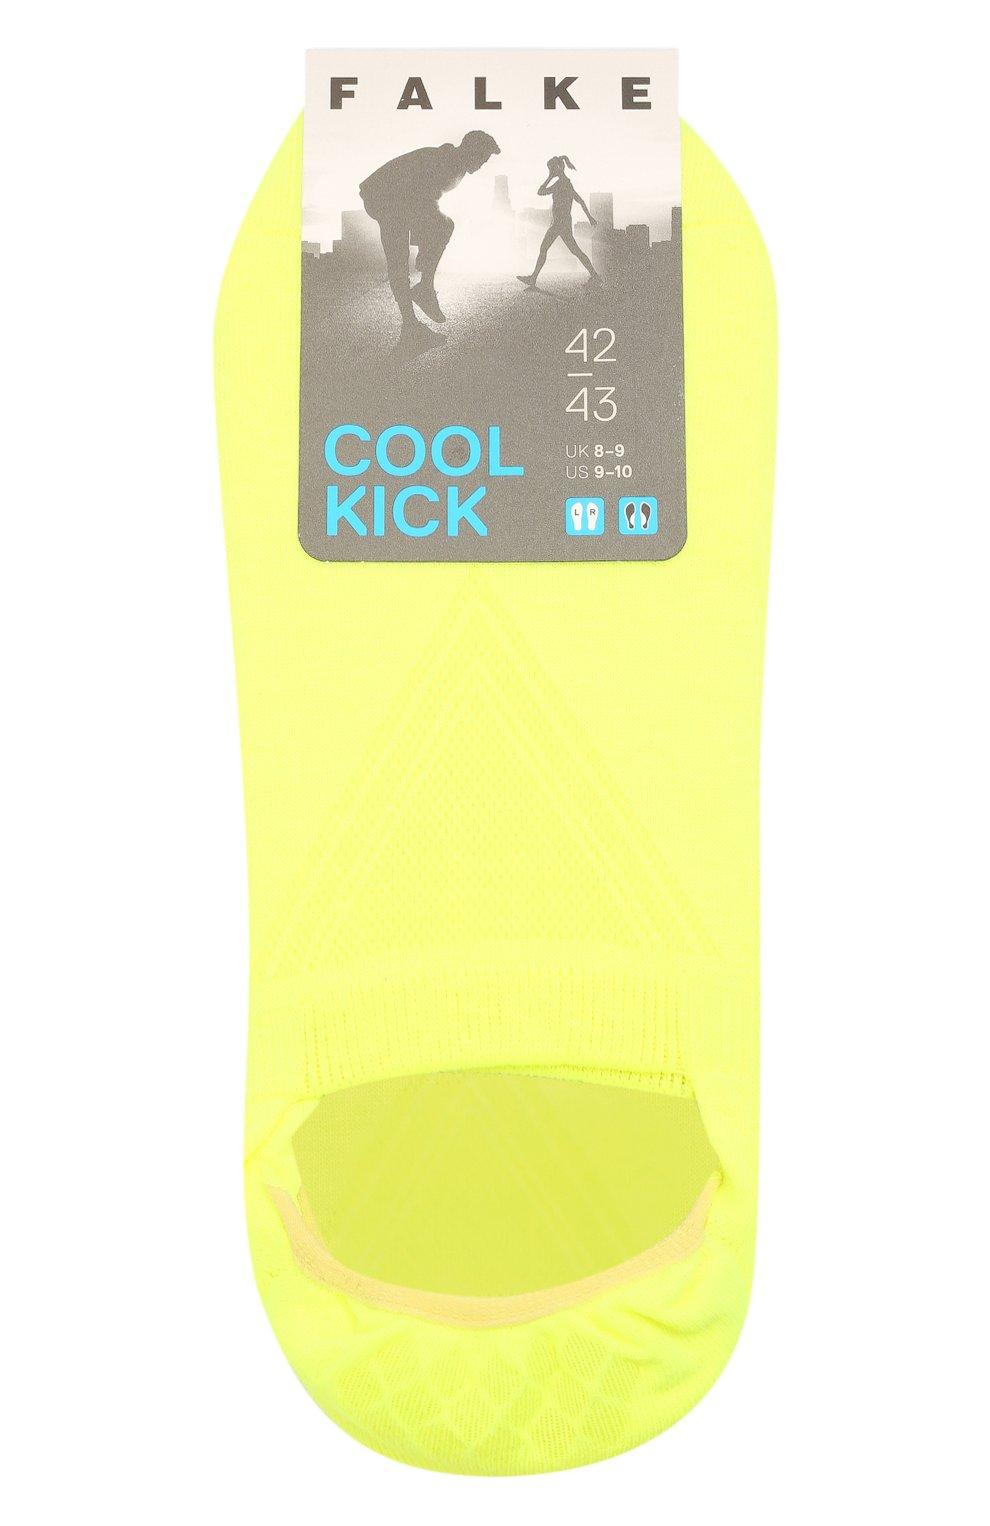 Мужские подследники cool kick FALKE желтого цвета, арт. 16601 | Фото 1 (Кросс-КТ: бельё; Материал внешний: Синтетический материал)